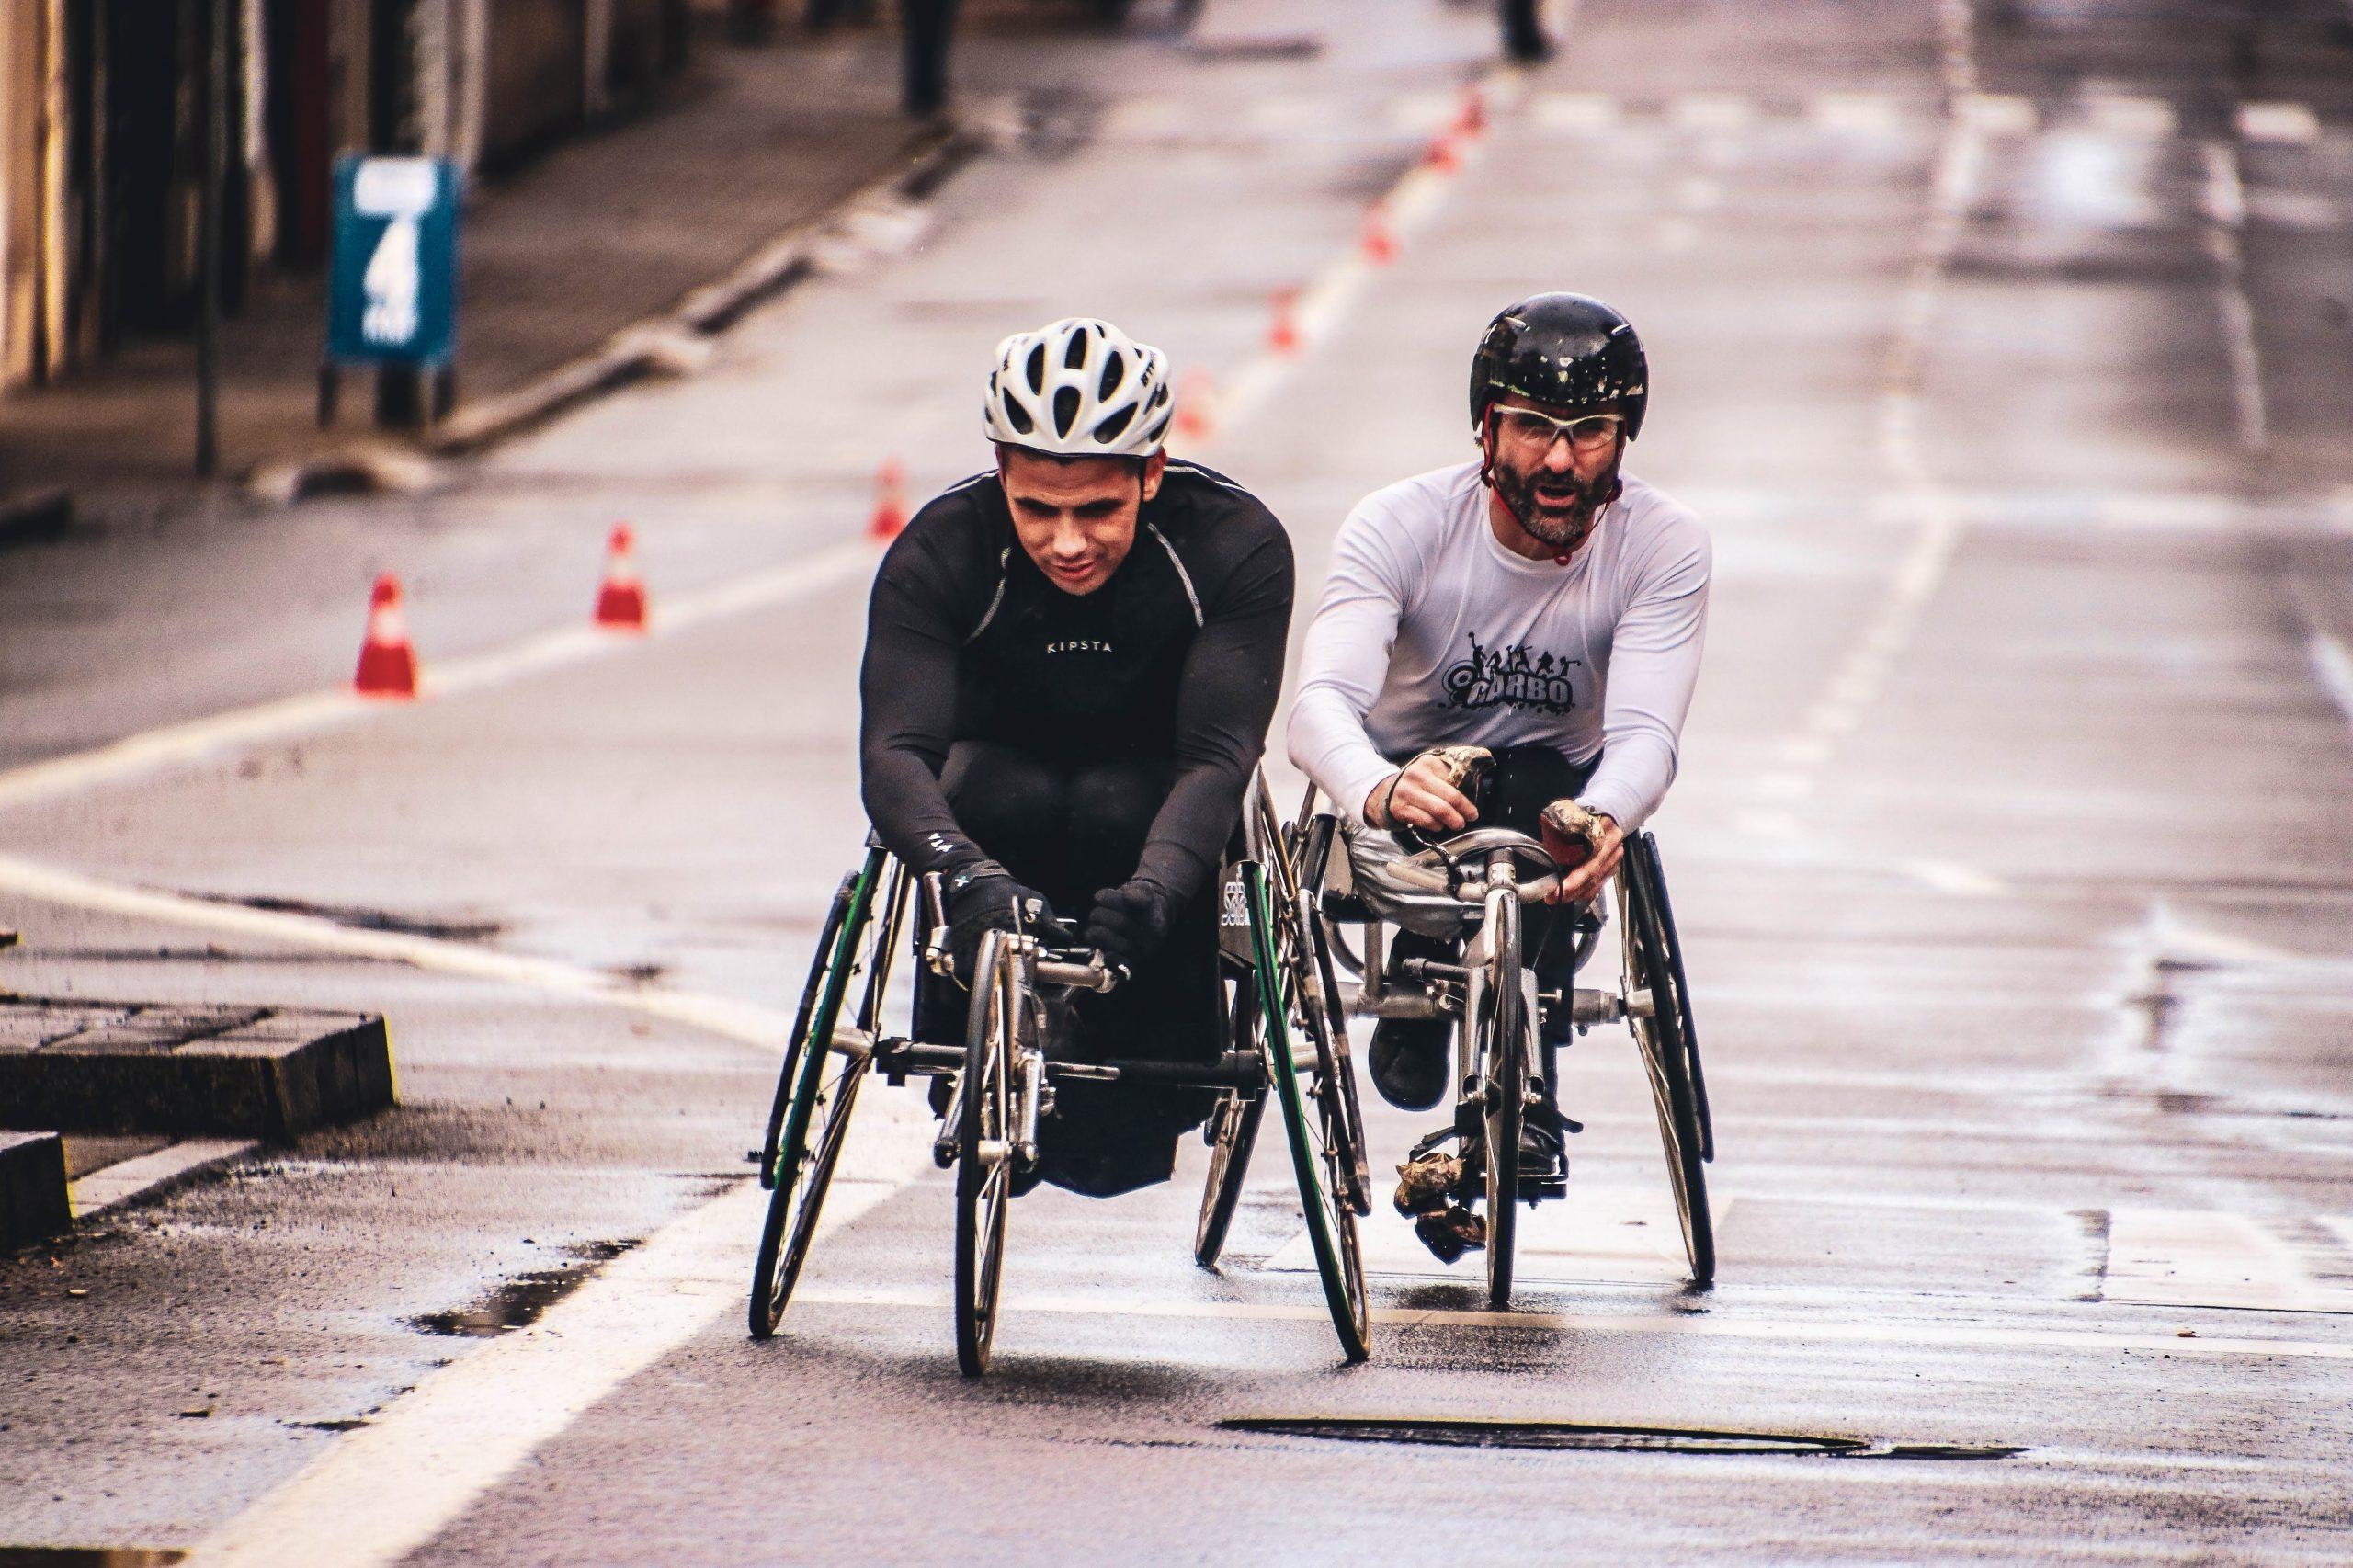 rouzbeh pirouz - disabled community